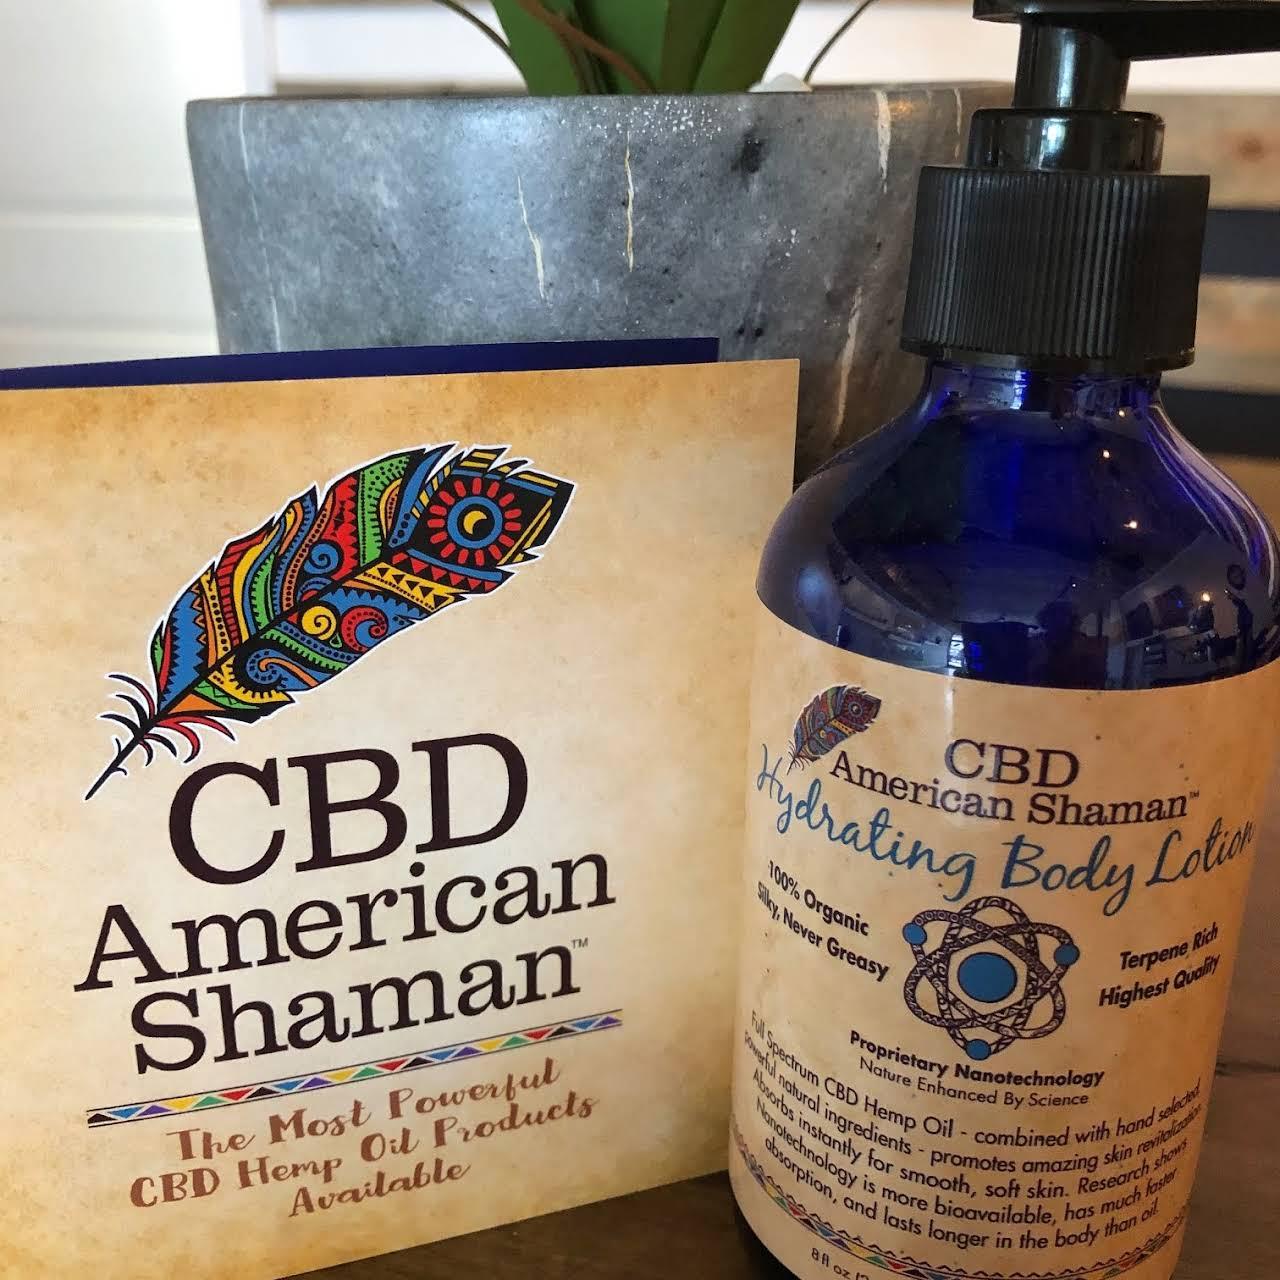 CBD American Shaman Fort Myers - American Shaman CBD - CBD Oil